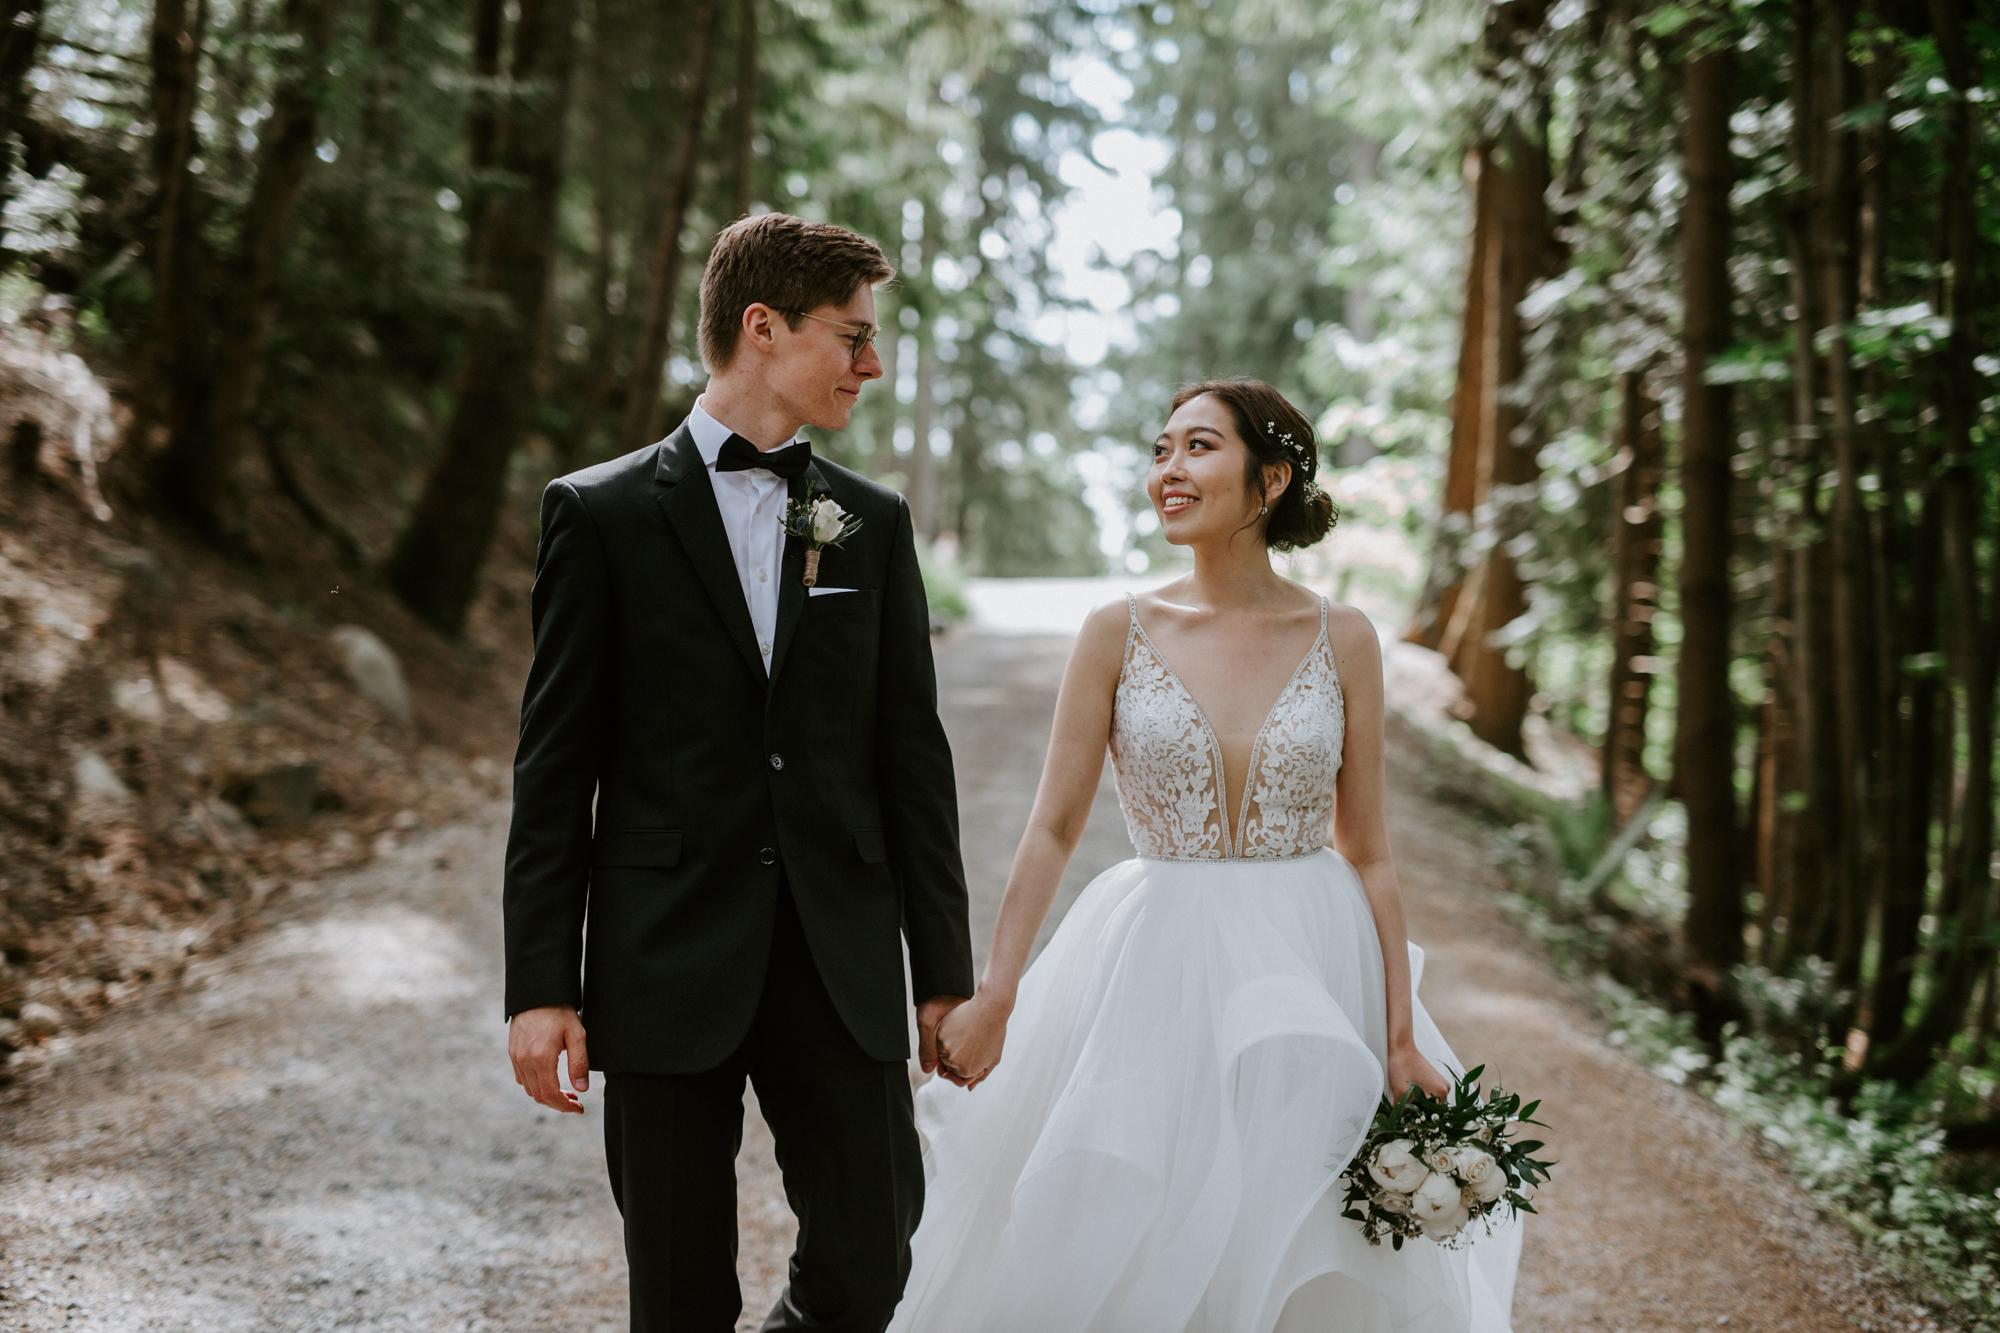 Yelim& Sorin- Wedding Day- HL-SD-81.JPG